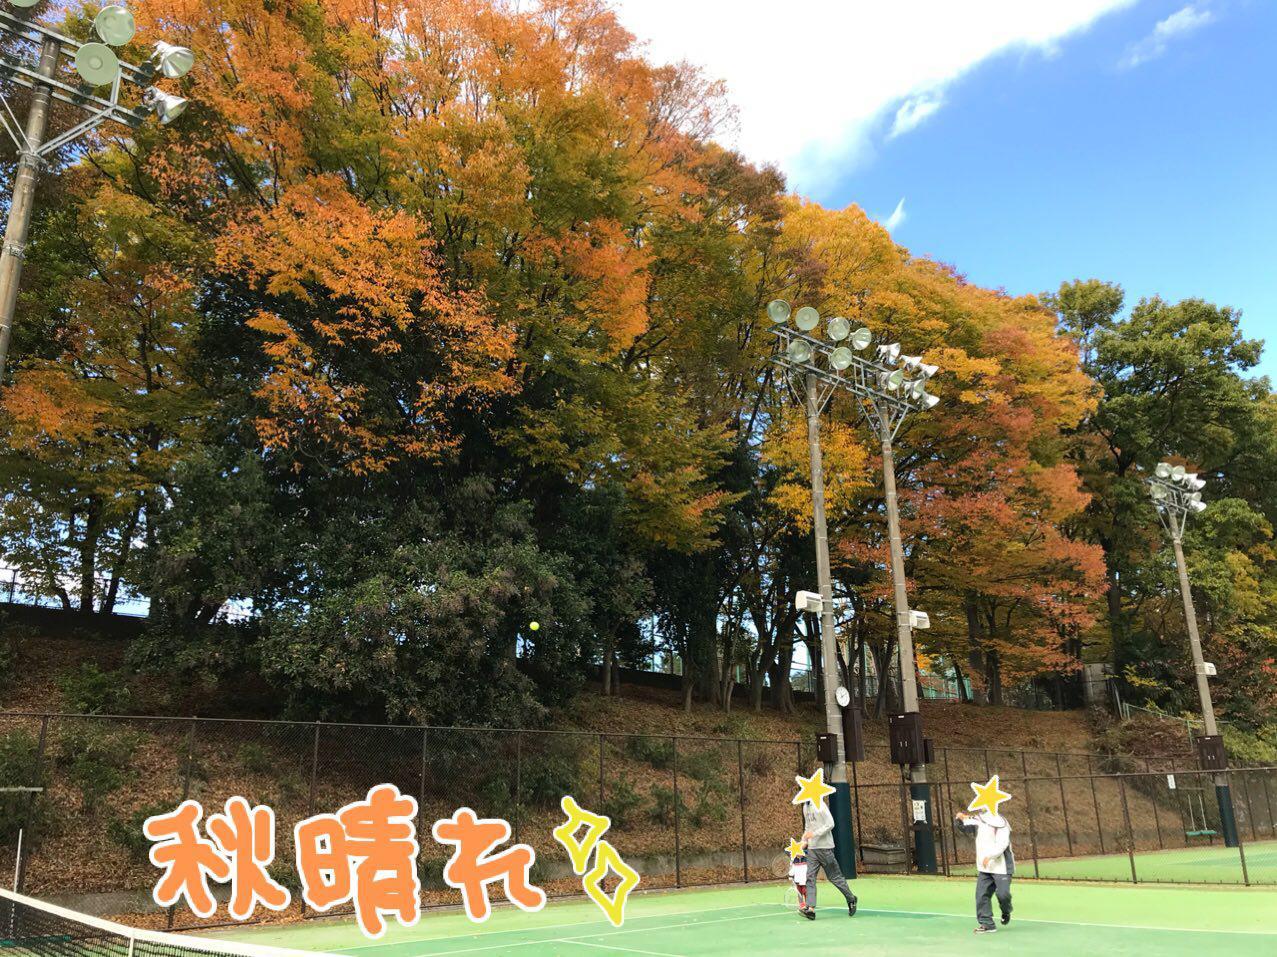 photo_2017-11-19_20-52-22.jpg